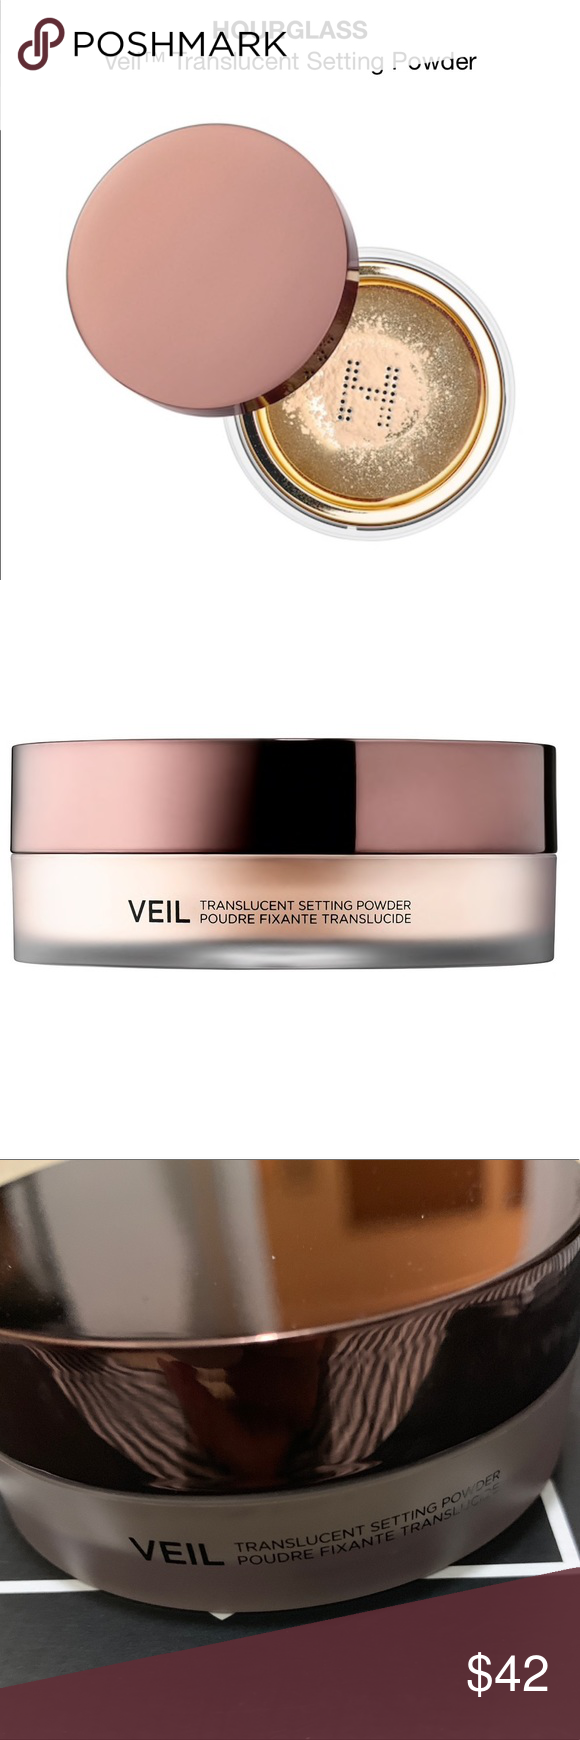 Hourglass Veil Translucent Setting Powder Setting Powder Translucent Sephora Makeup